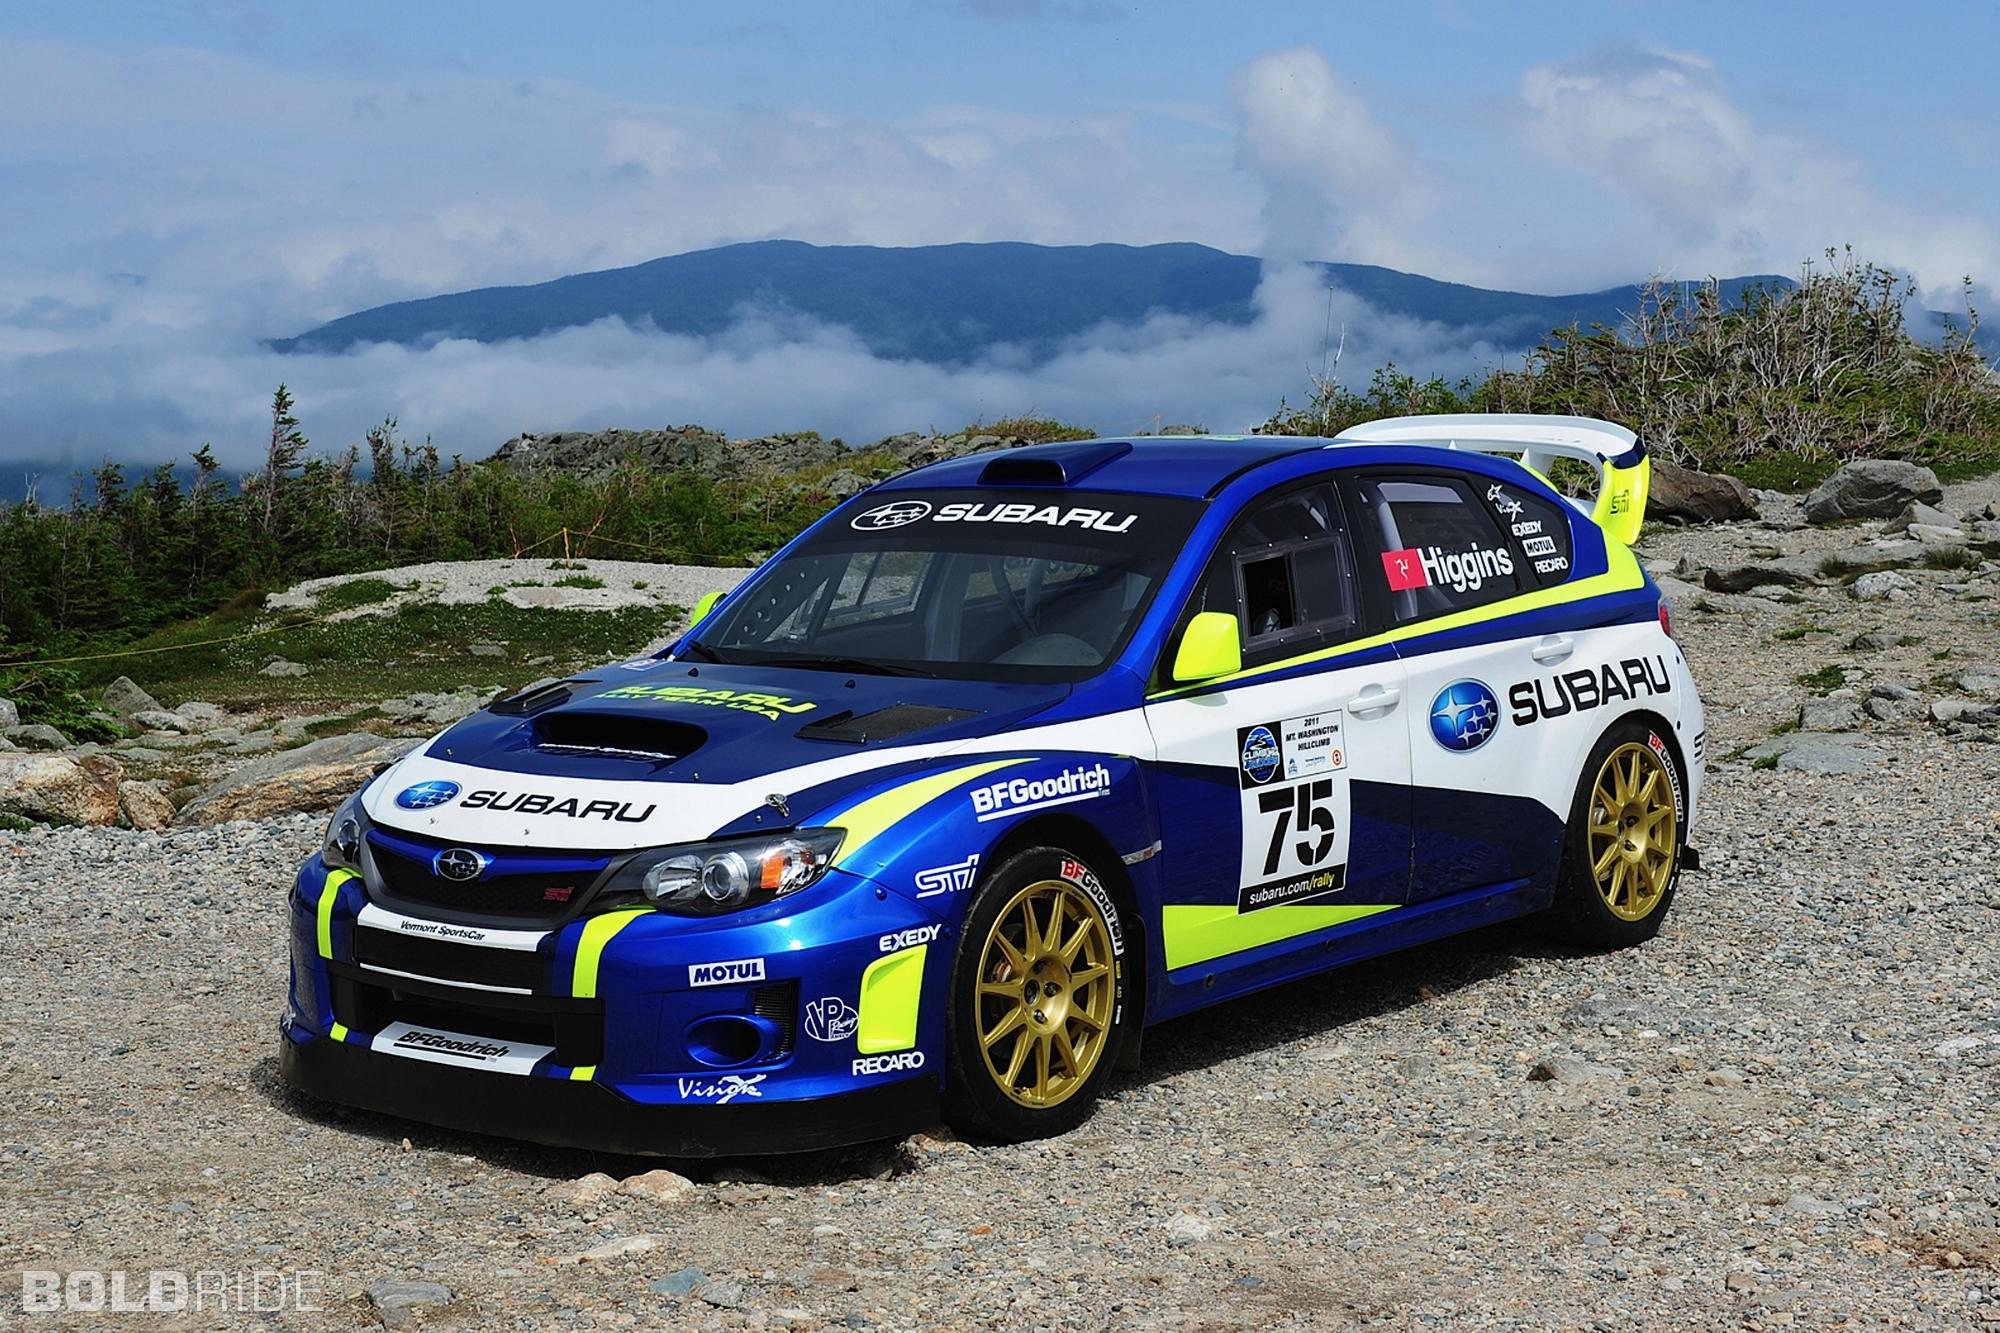 Subaru Wrx Sti Picture 11 Reviews News Specs Buy Car